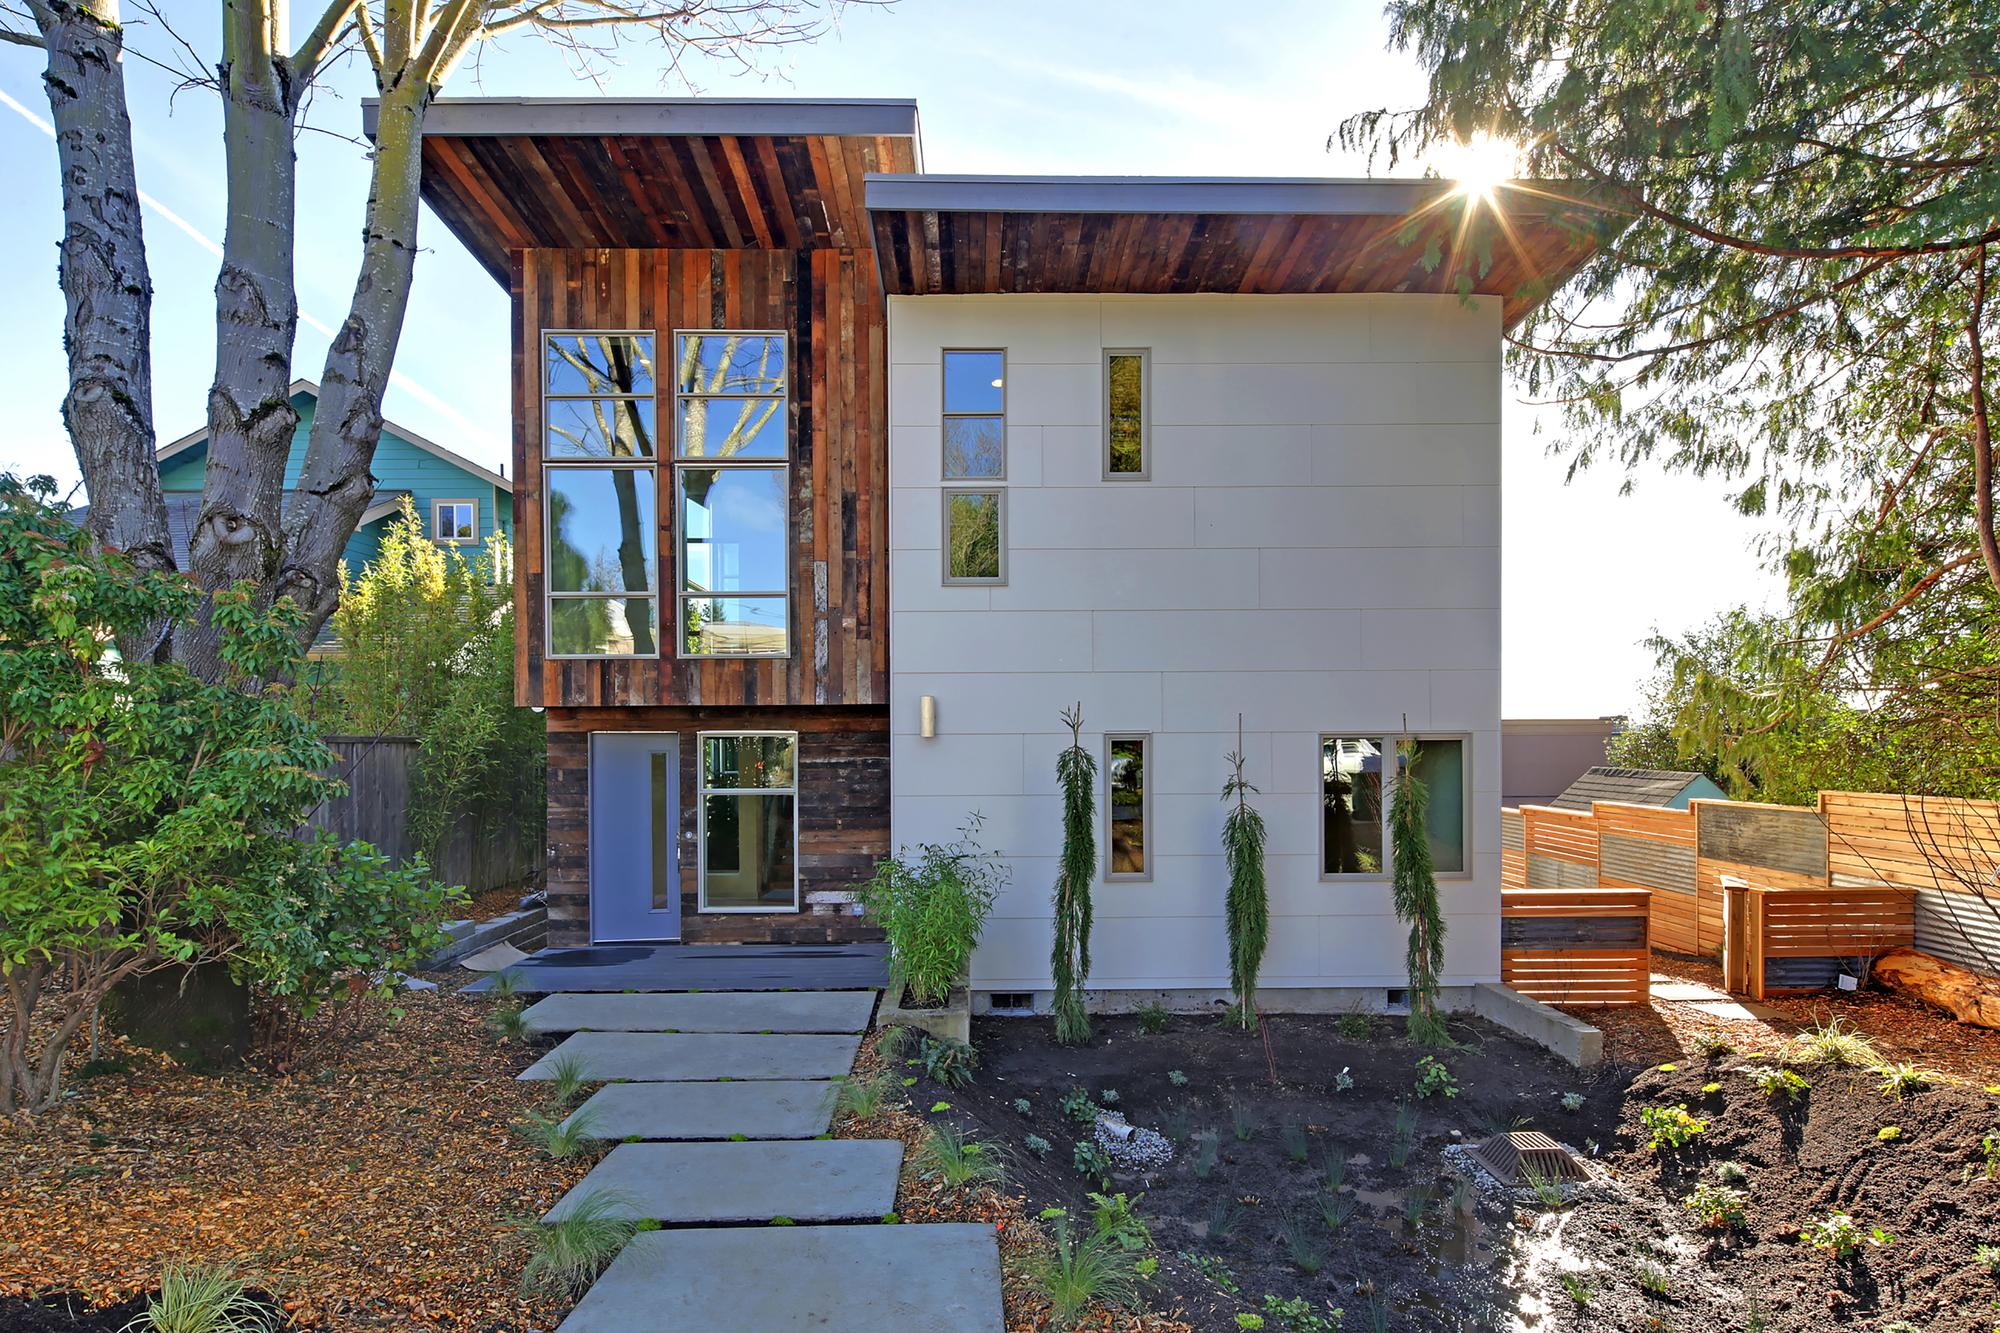 Un buen ejemplo de arquitectura sostenible blog de dsigno for Casas modernas en washington